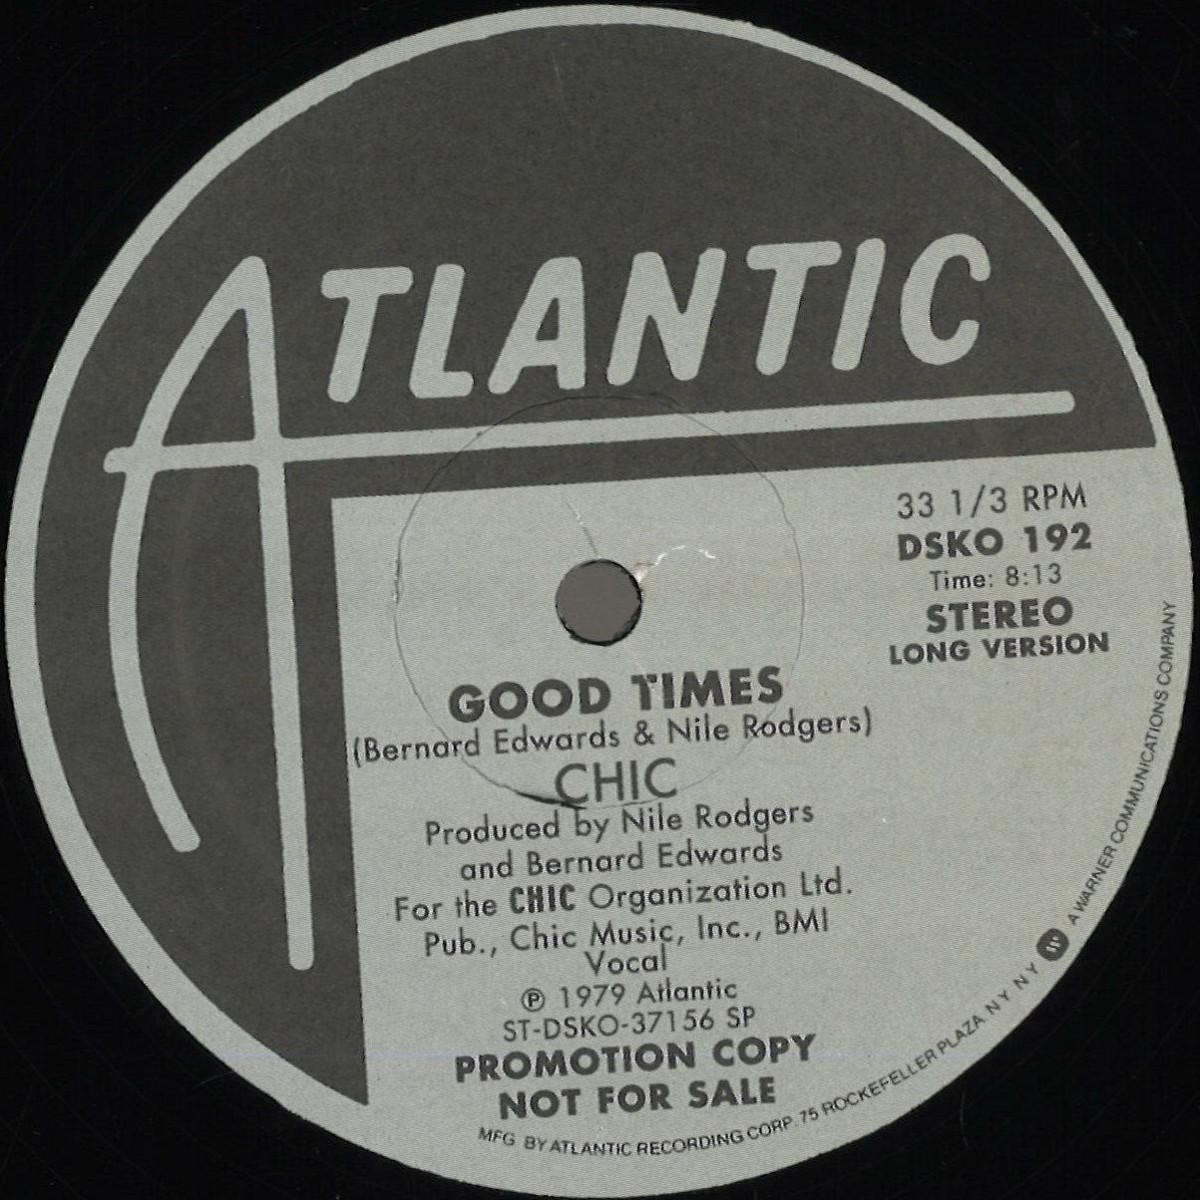 Chic - Good Times / Atlantic UK DSKO192 - Vinyl